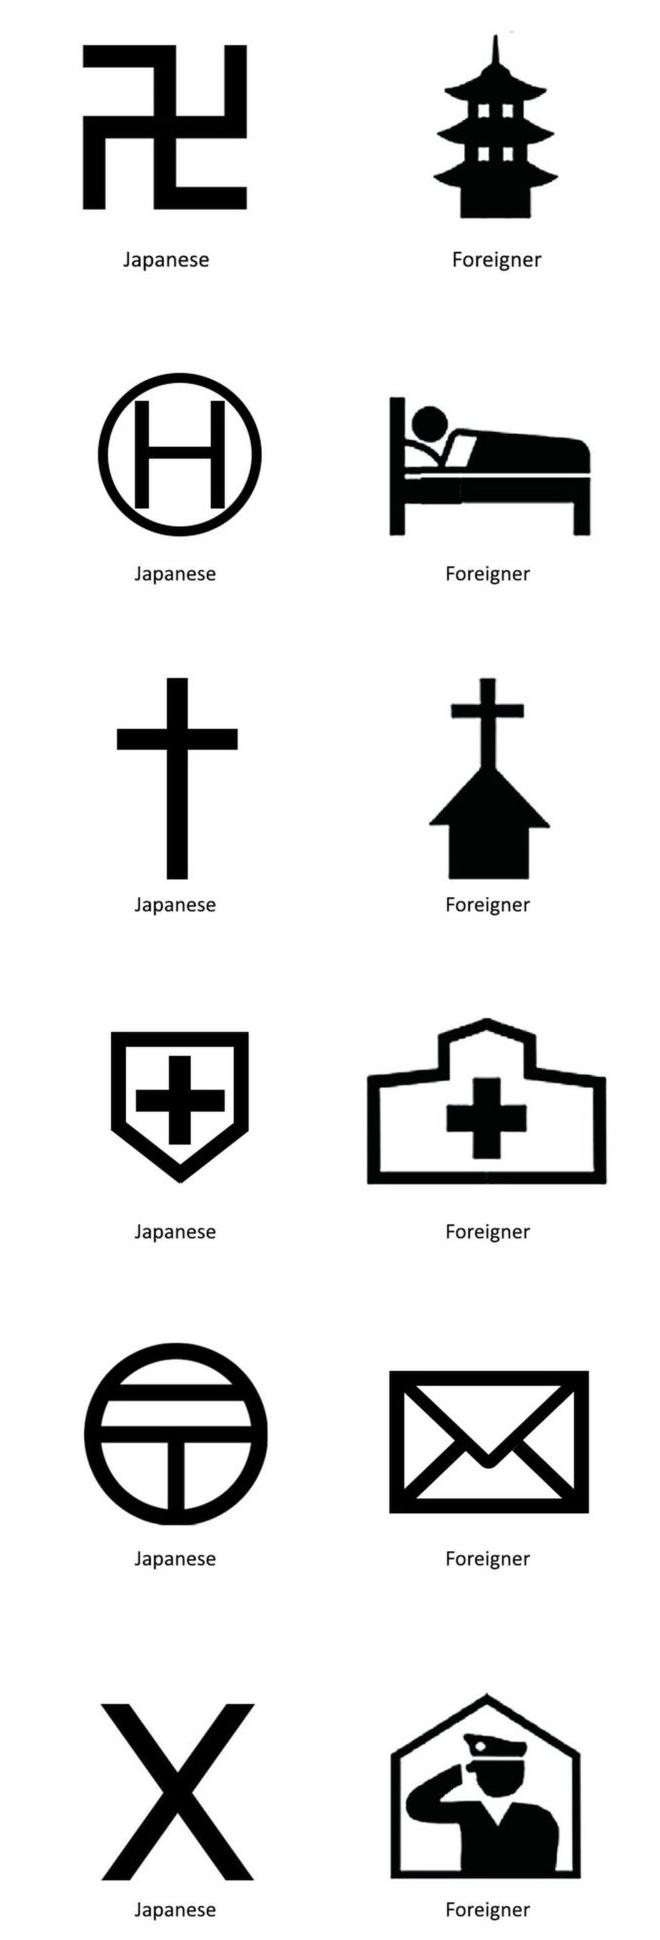 Proposed map symbols